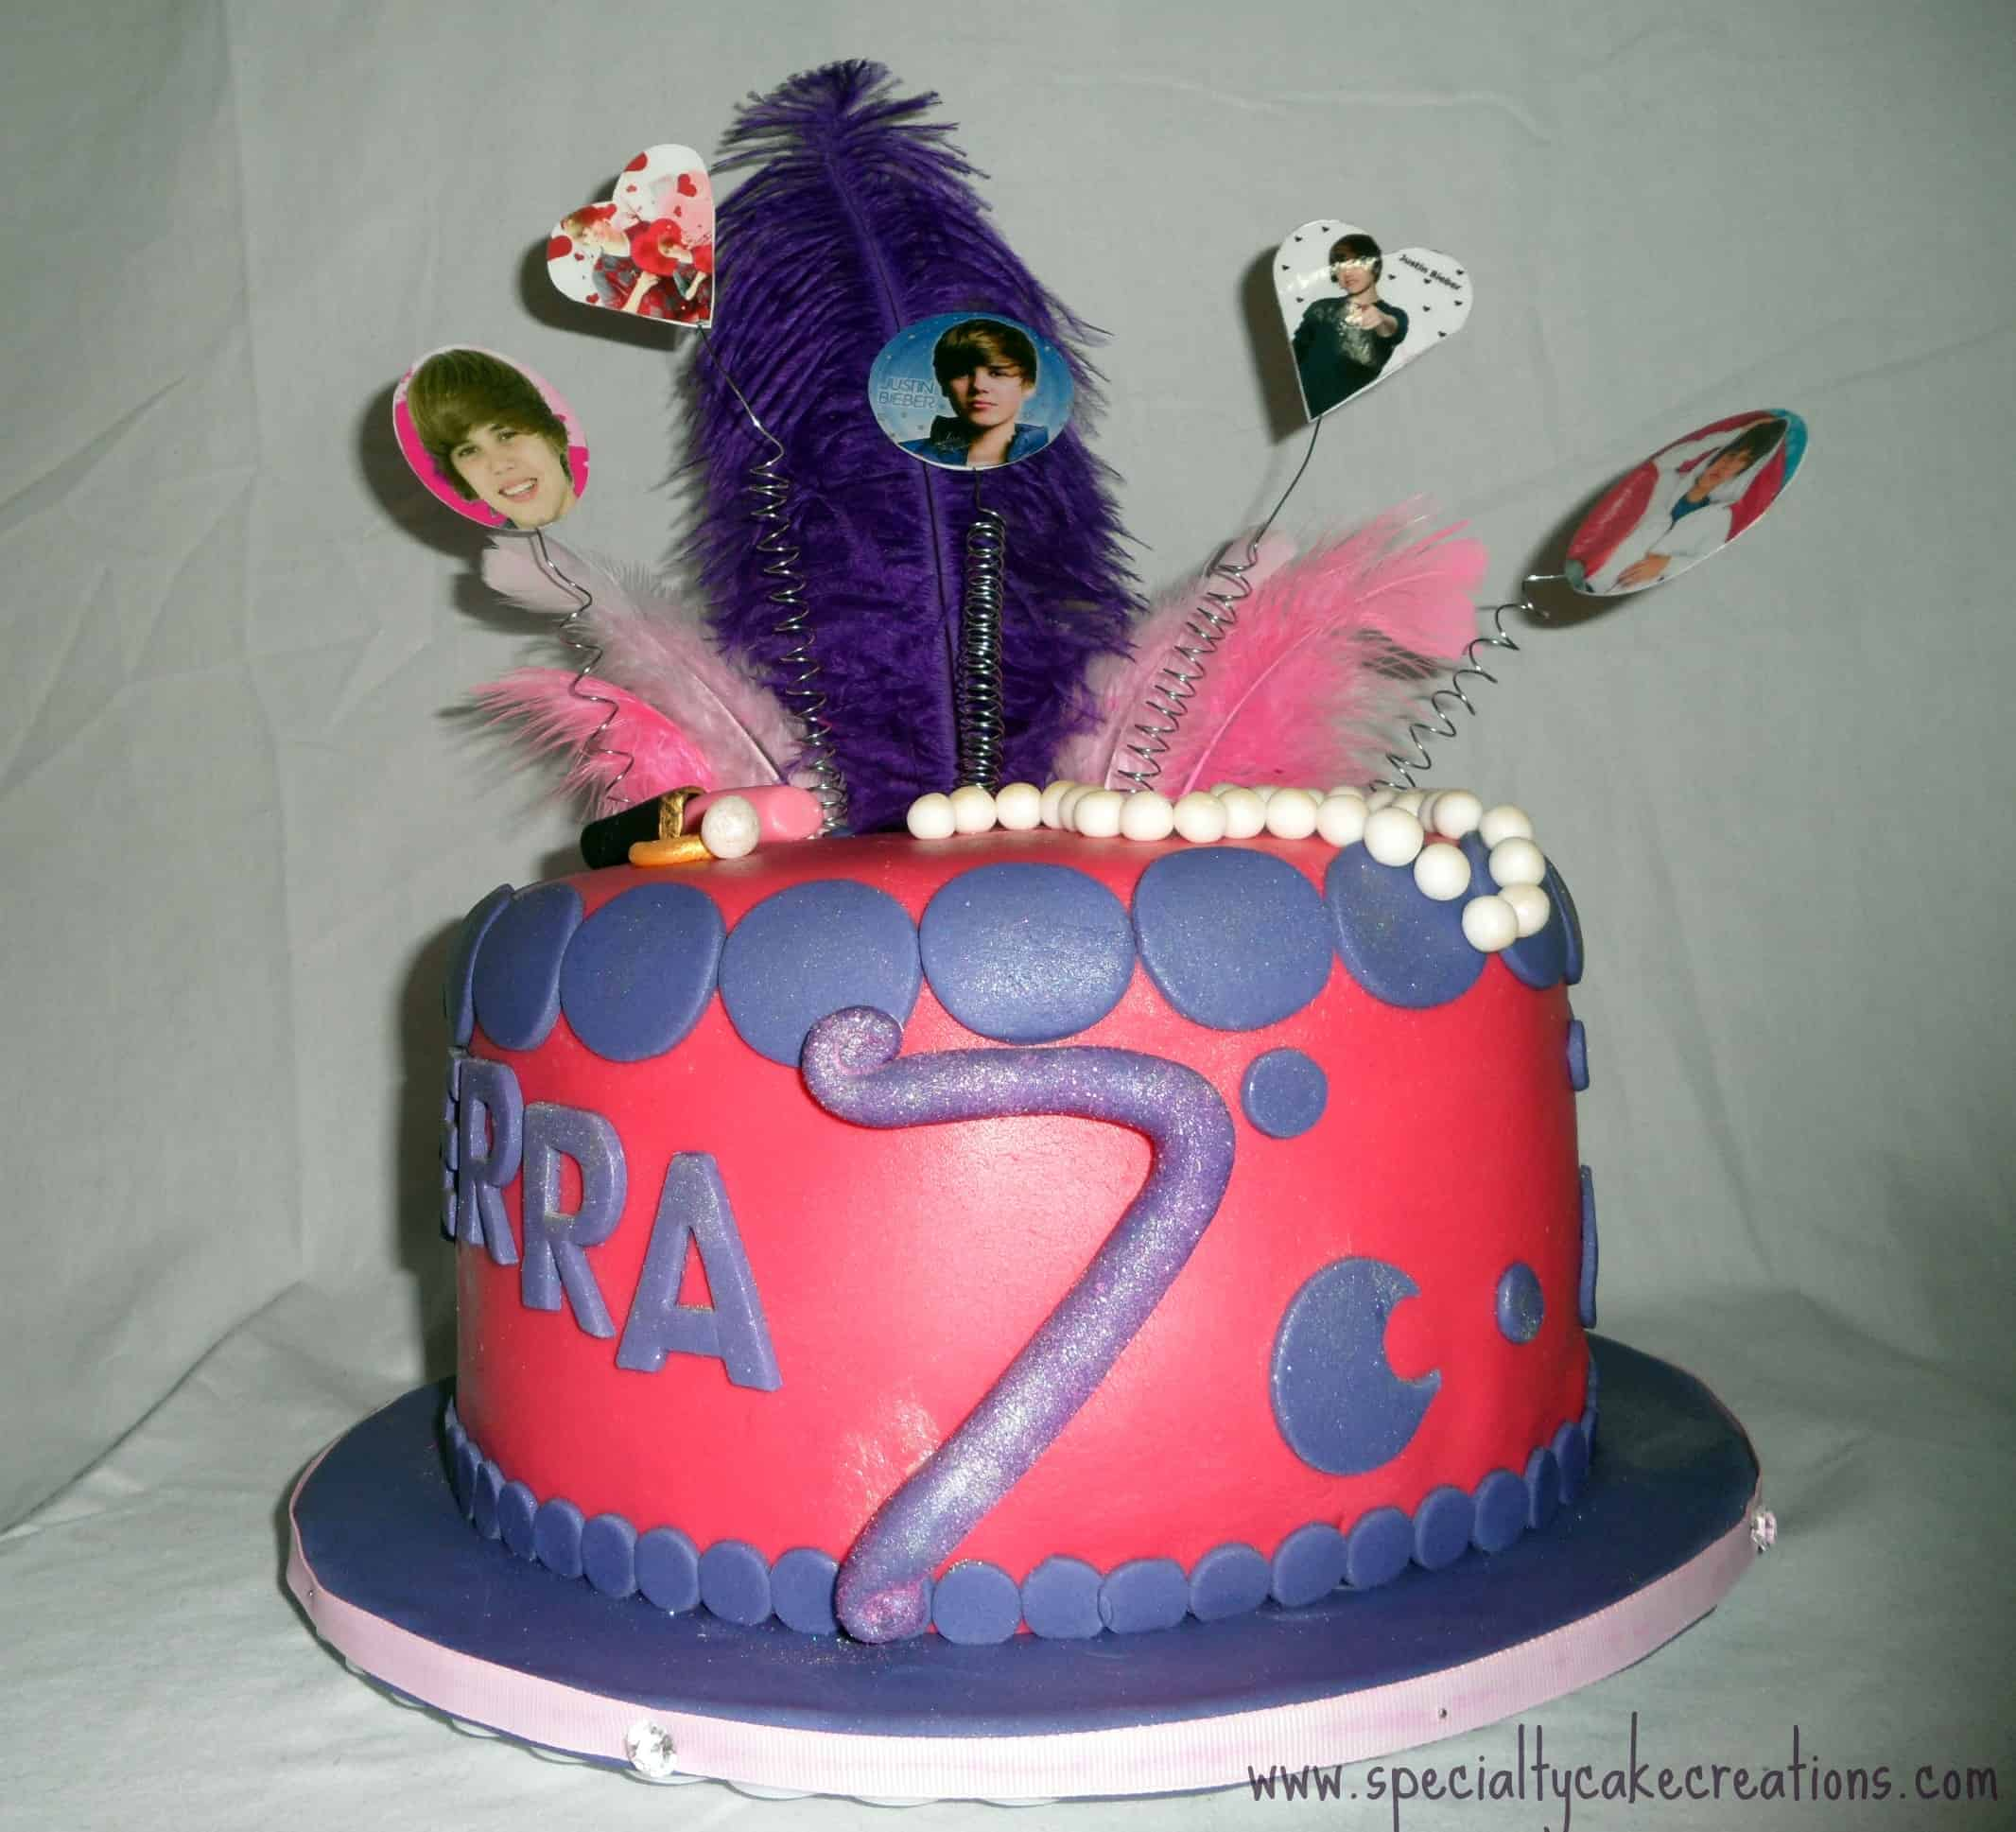 Justin Bieber Favorite Cake Flavor